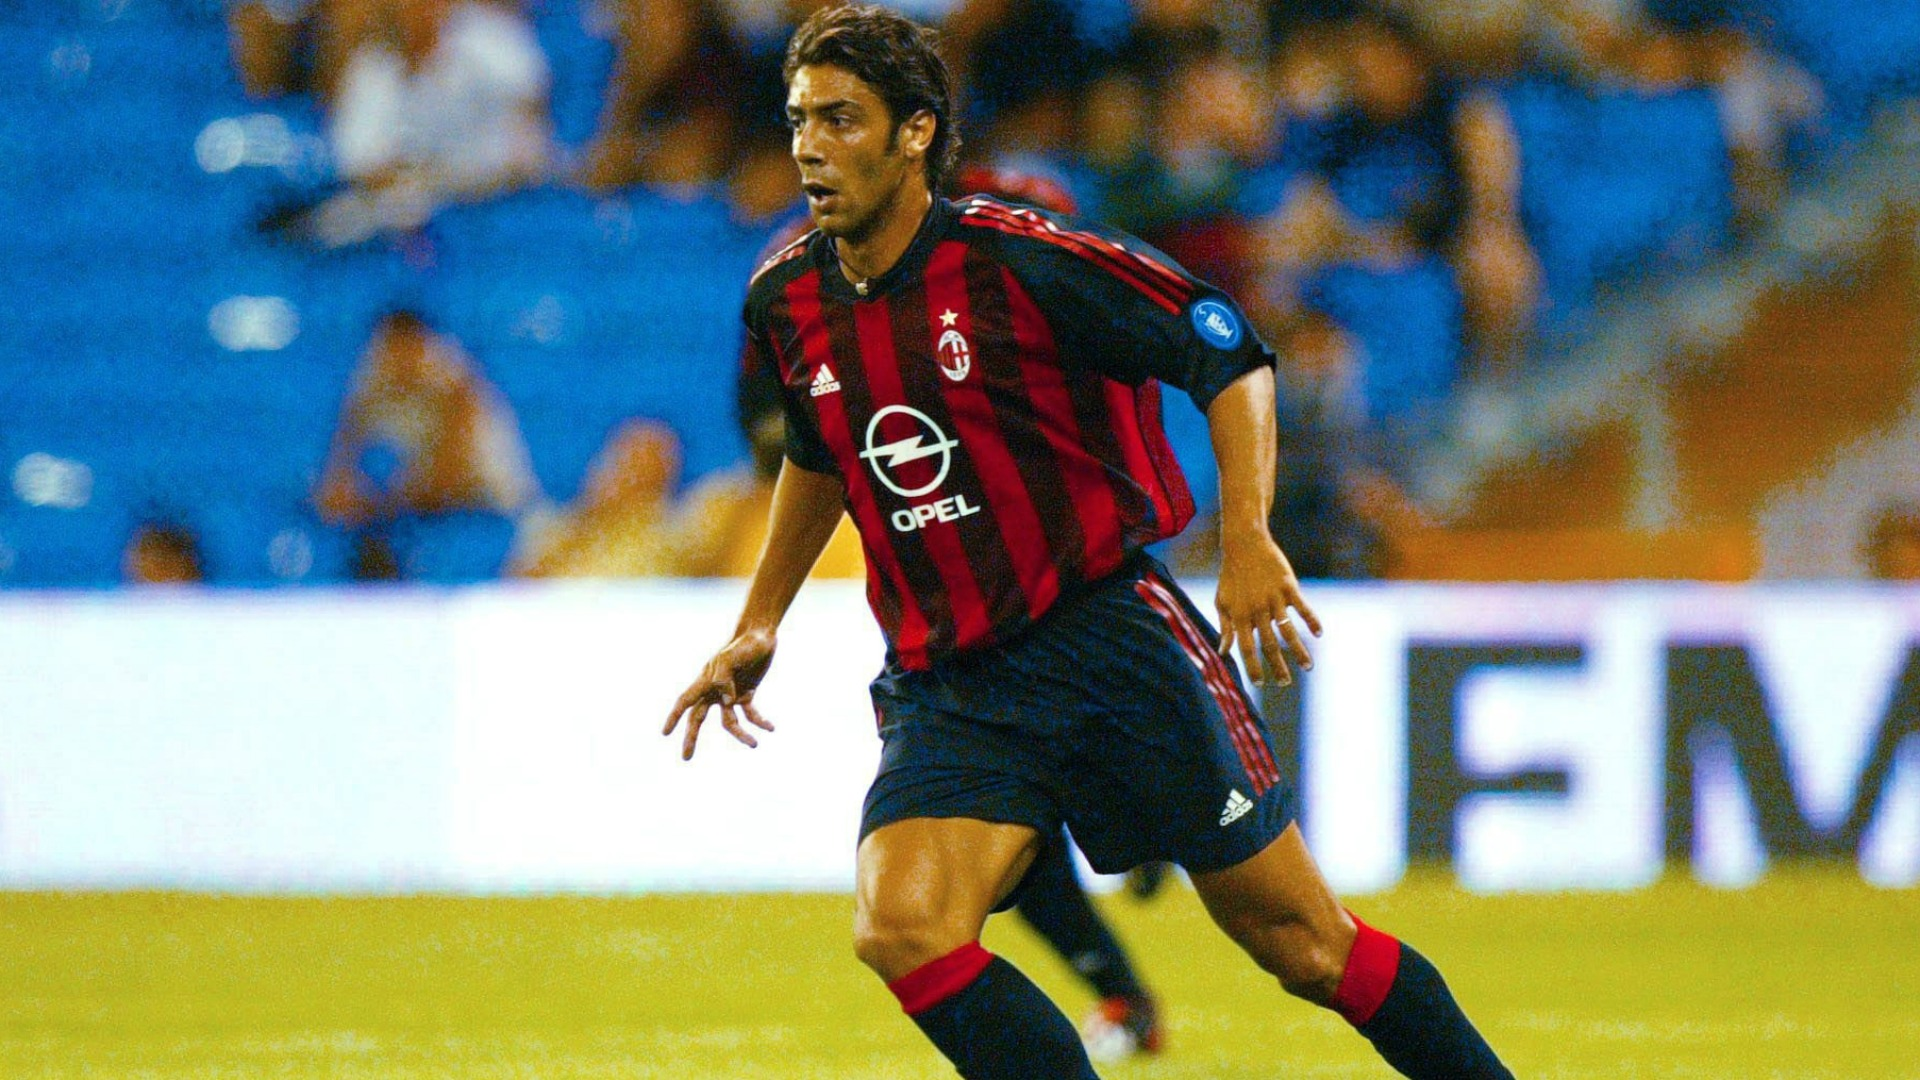 Rui Costa Milan Goal